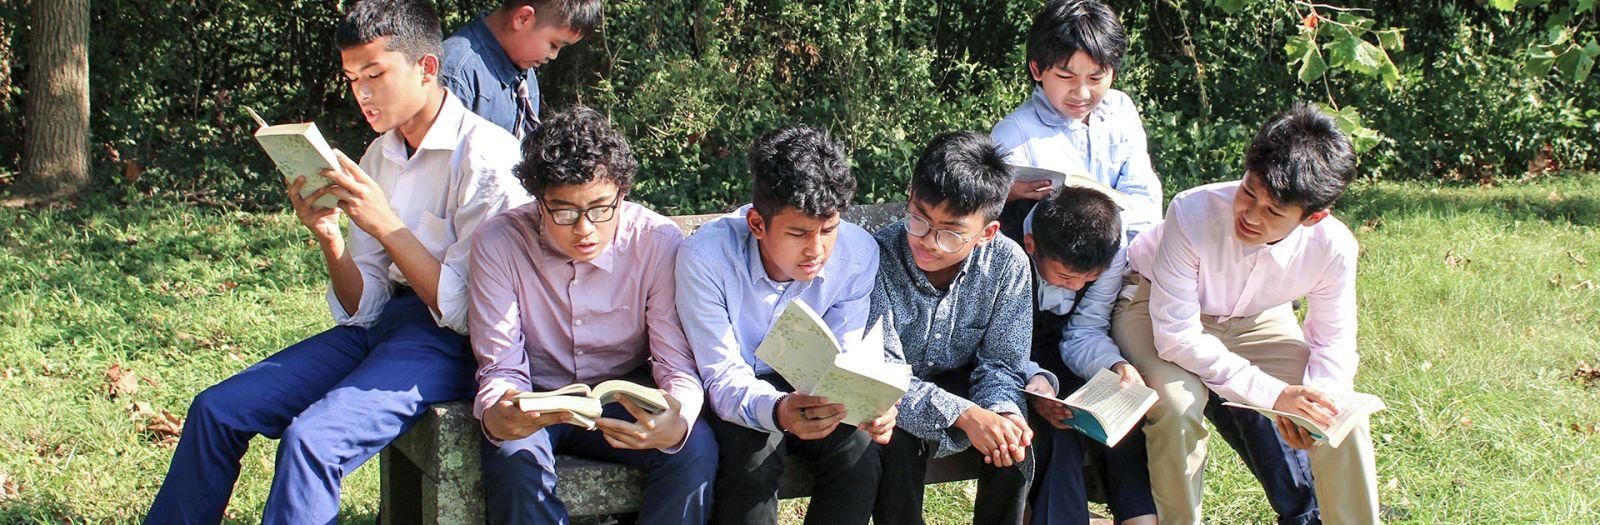 UAMA, Islamic Education, Islamic School